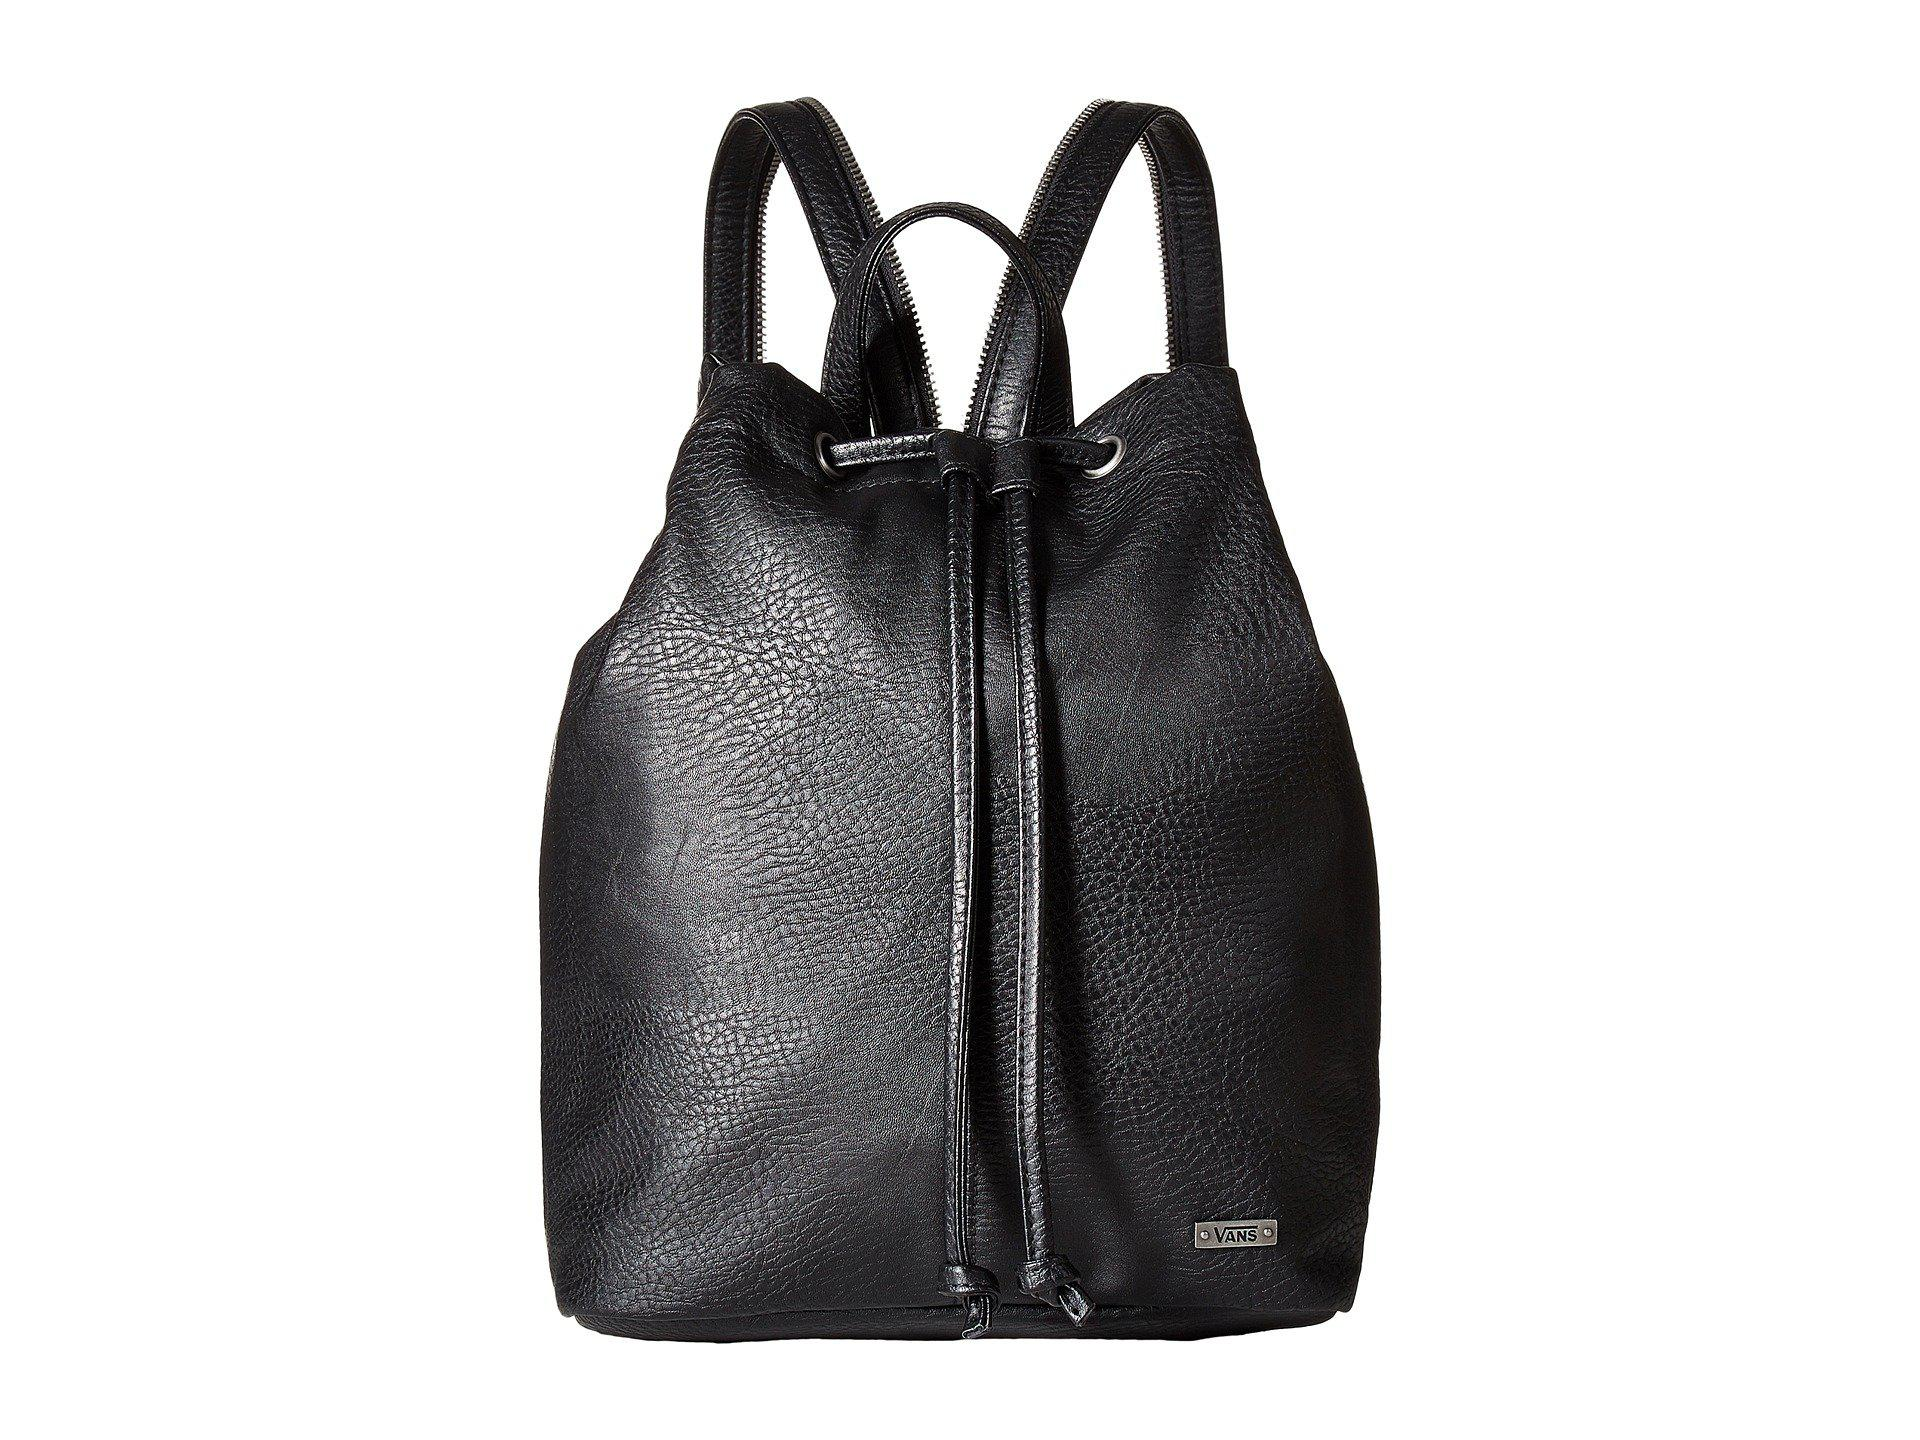 e7d21d440a6 Lyst - Vans Mili Cinch Bag in Black